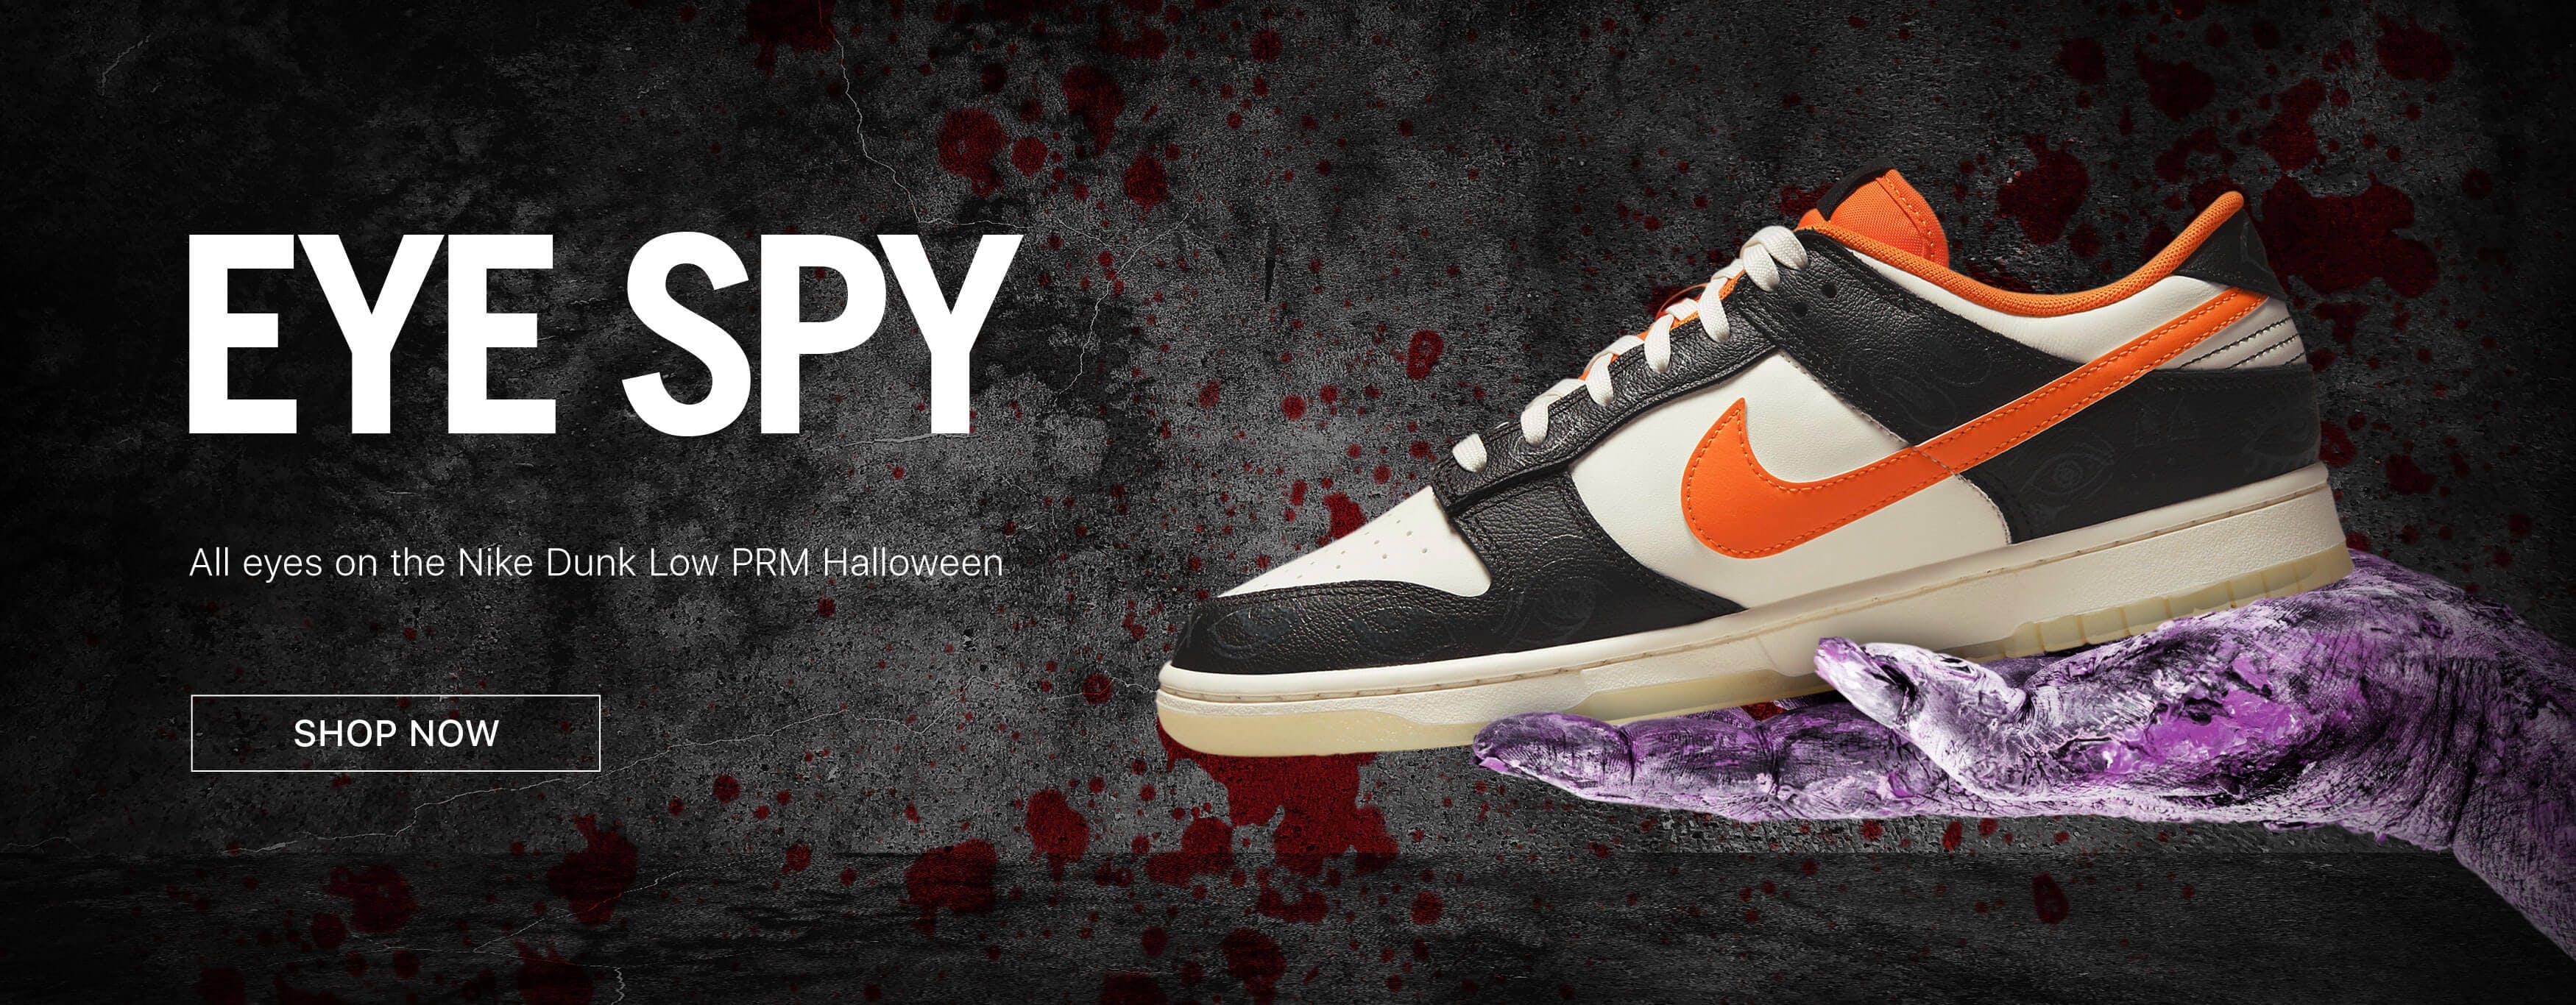 Nike Dunk Low prm Halloween